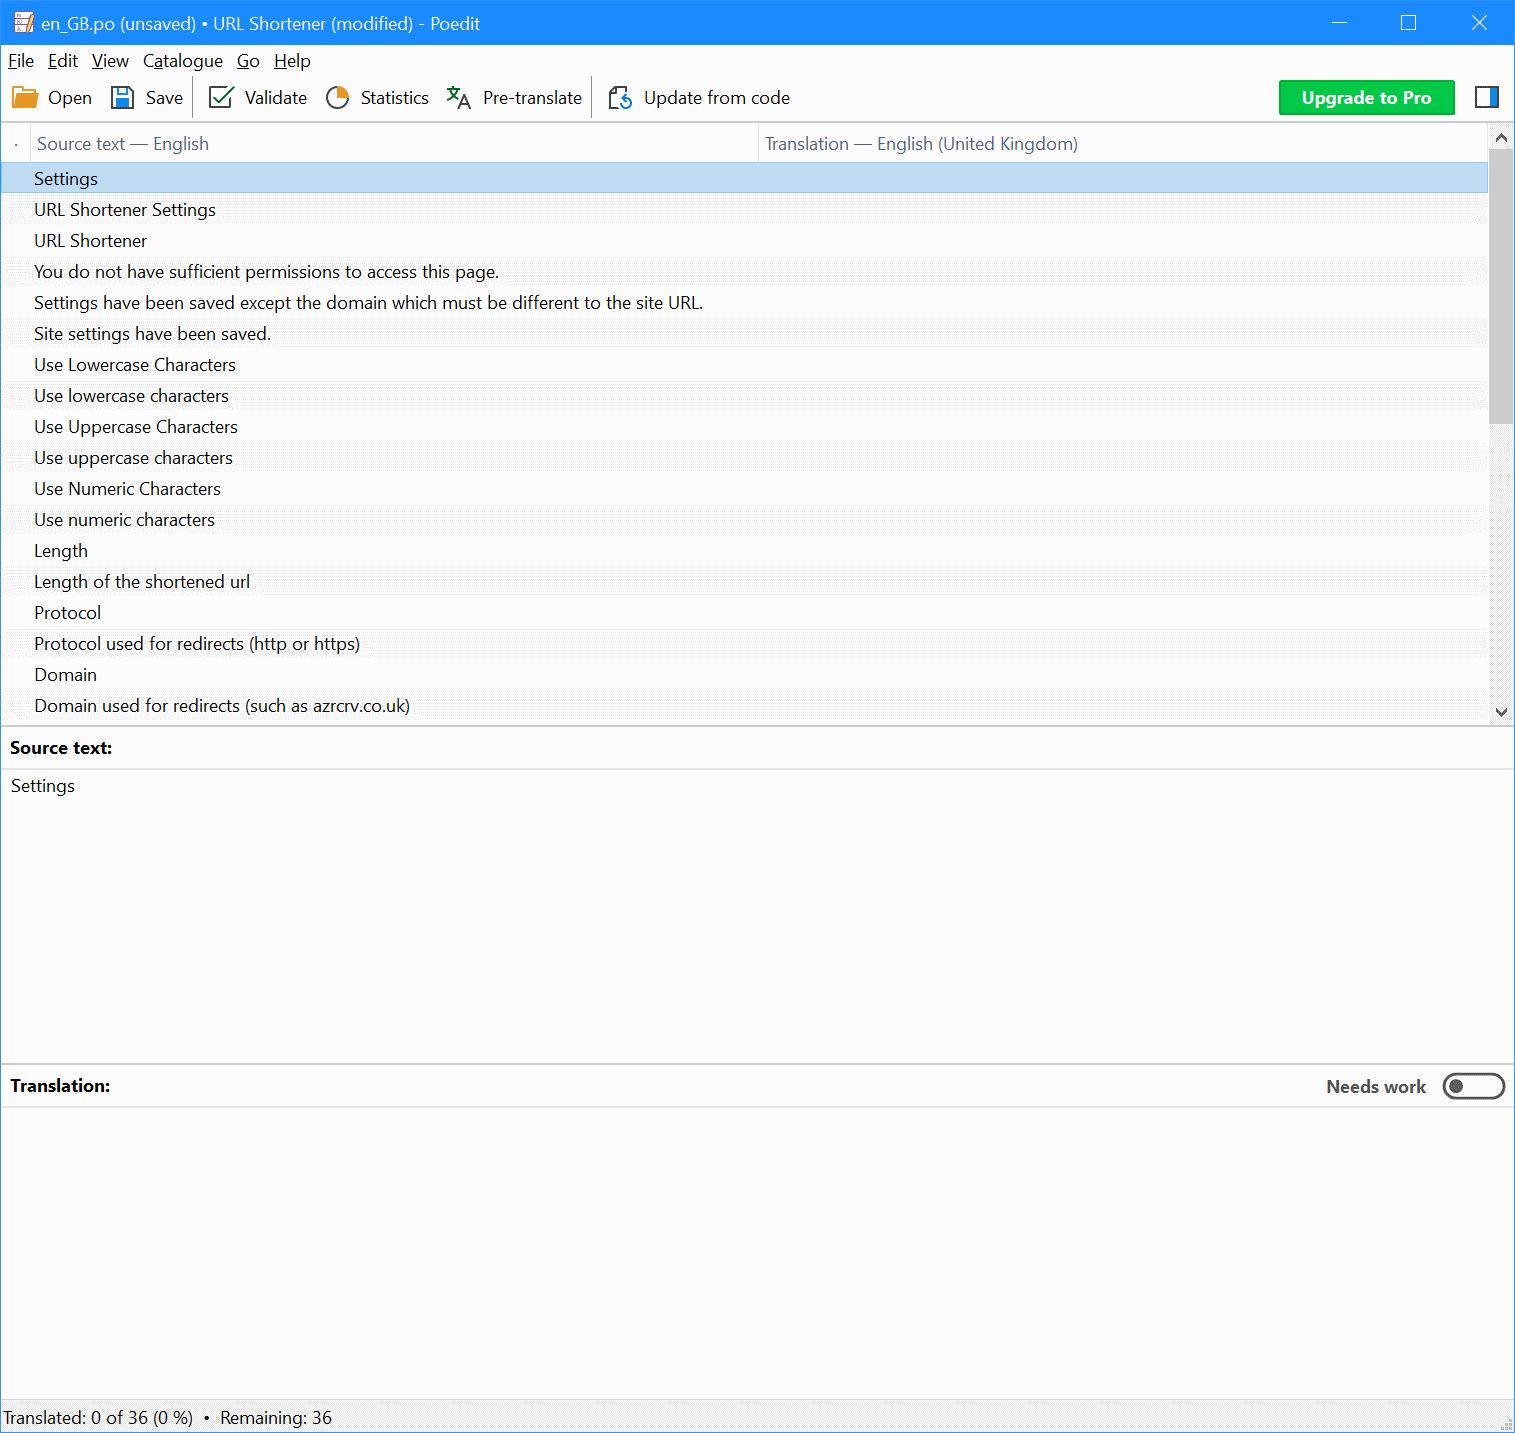 Poedit translation screen